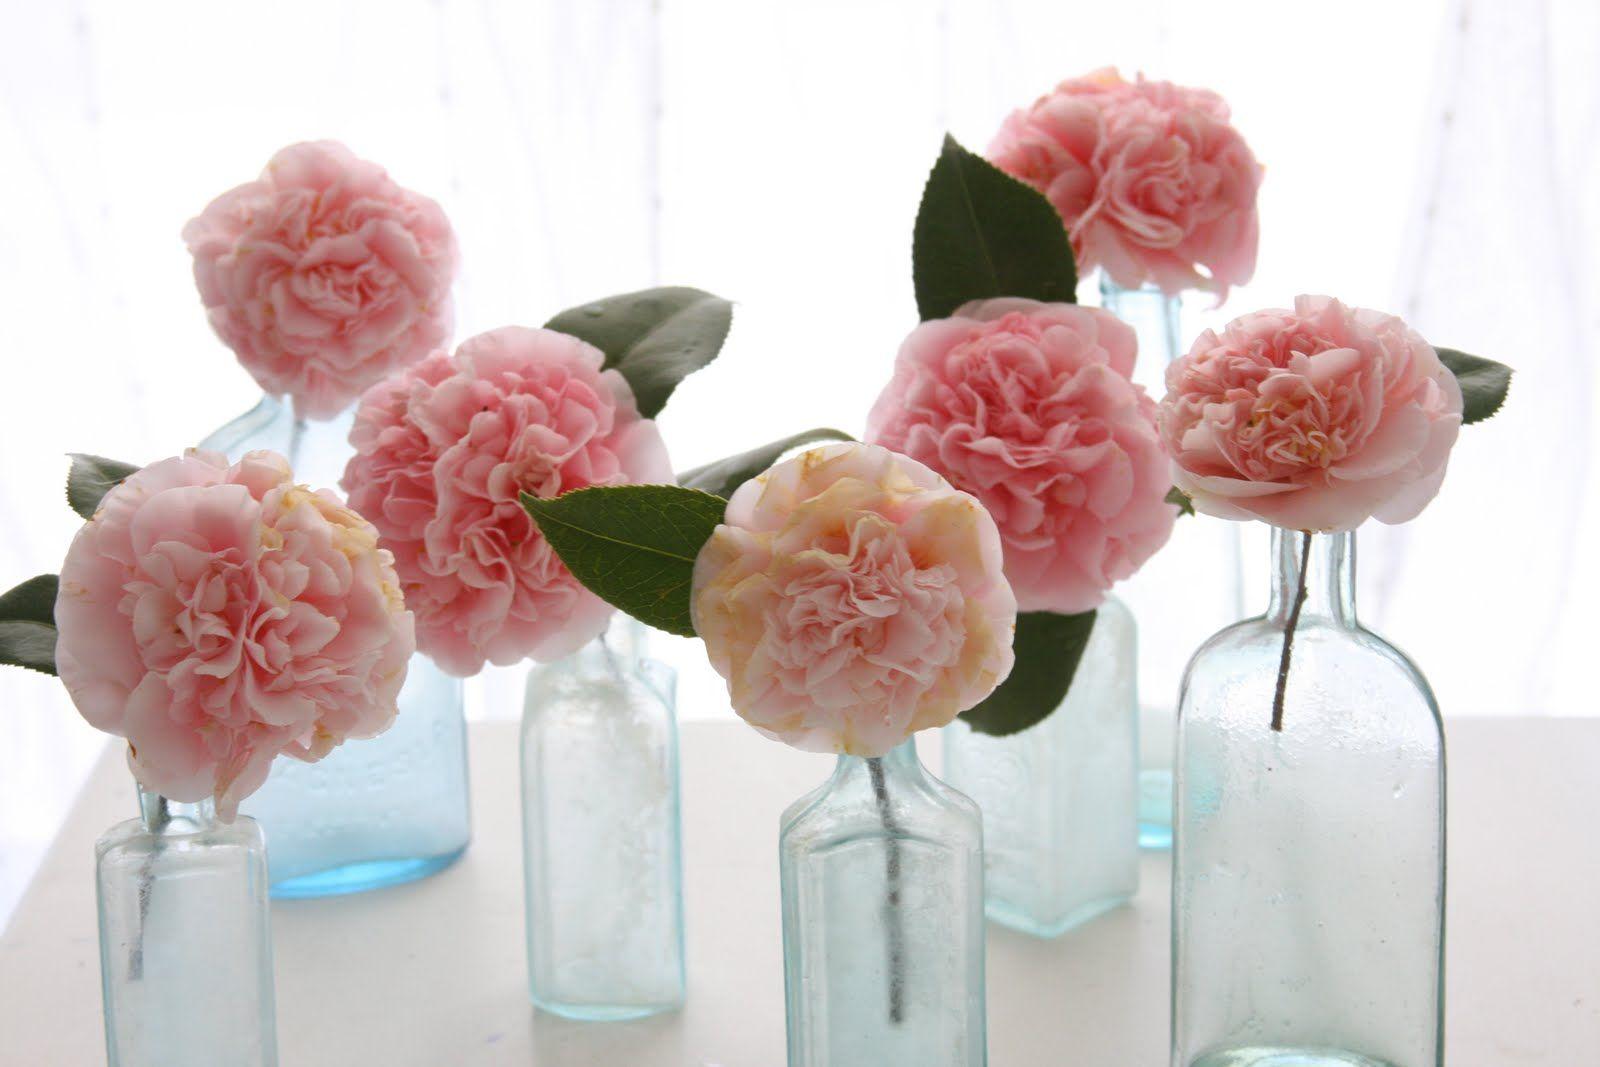 love the single flower :)